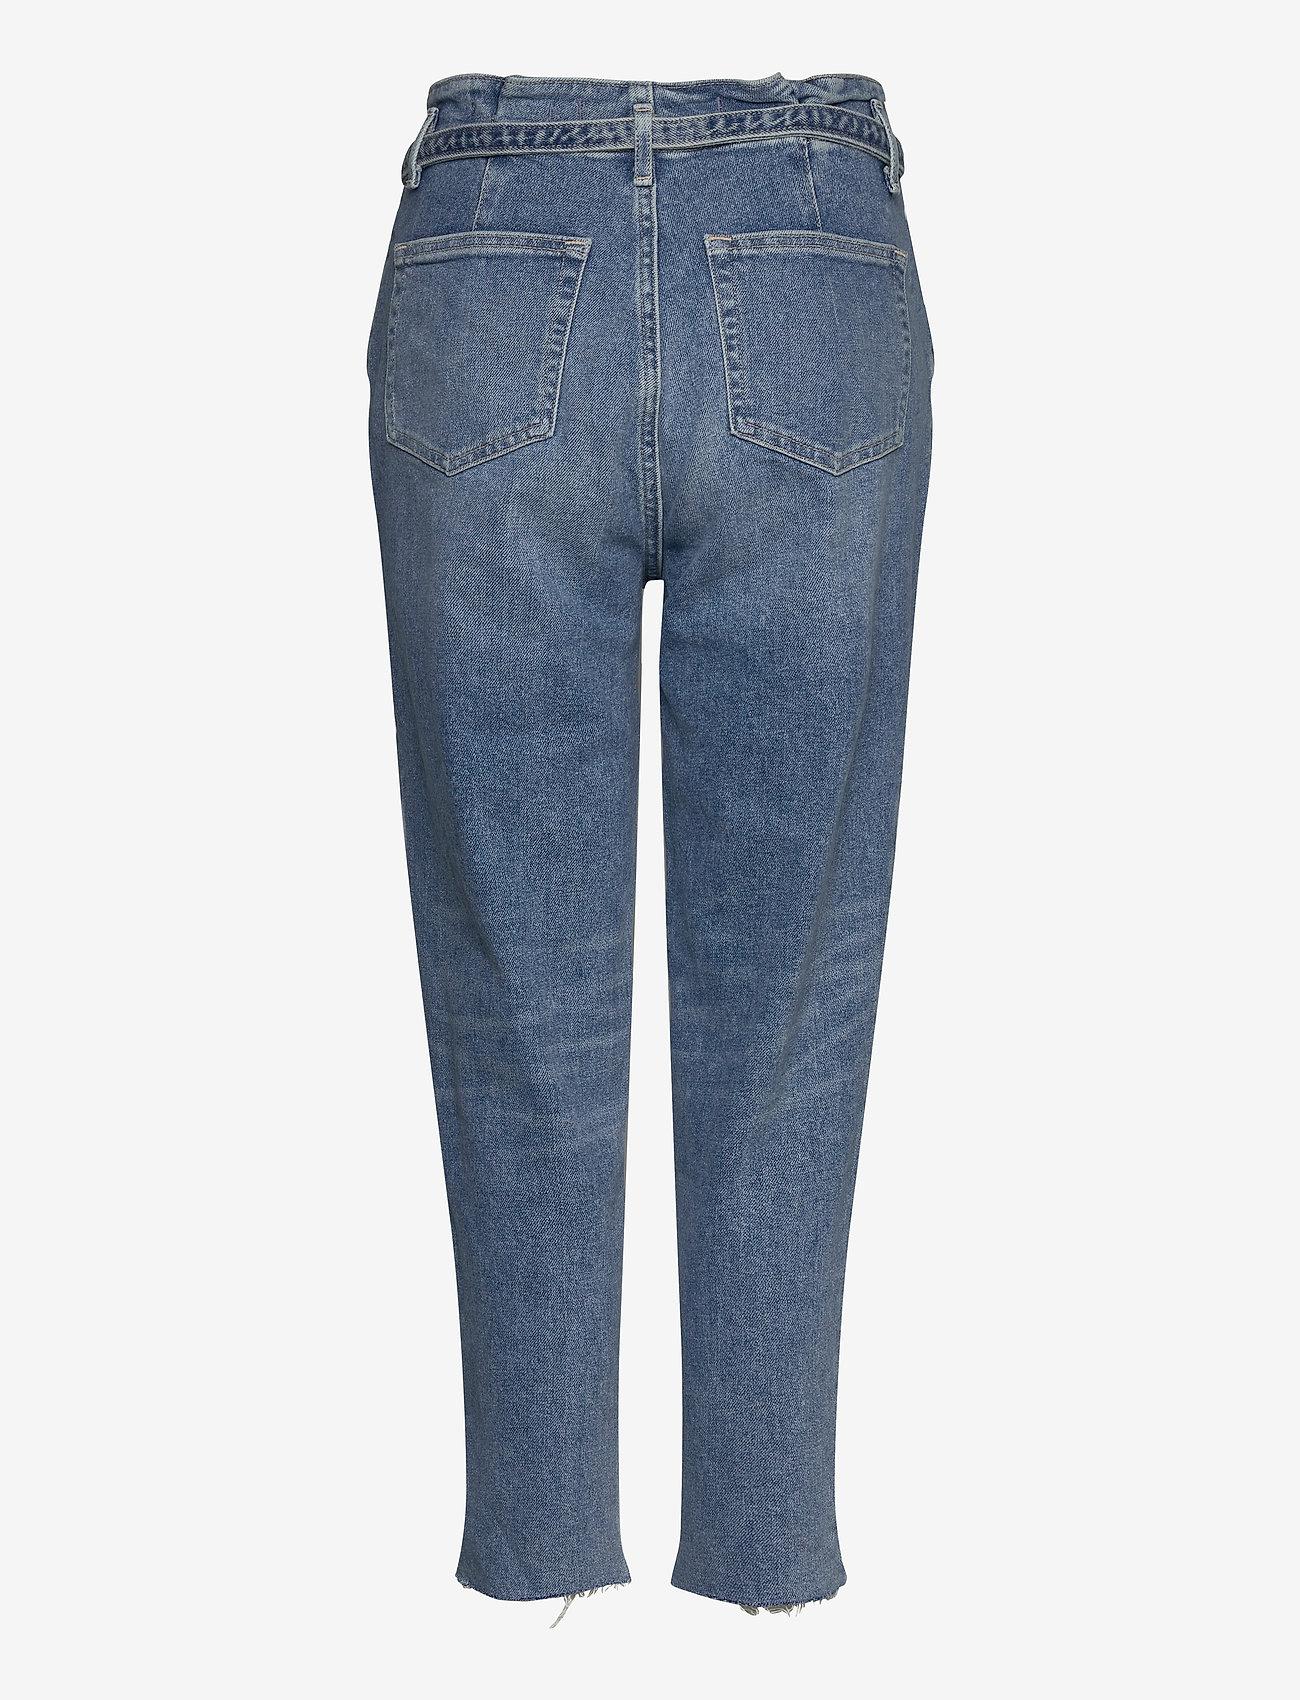 Mom Jeans (Light Destroy) - Hollister TJpYAm